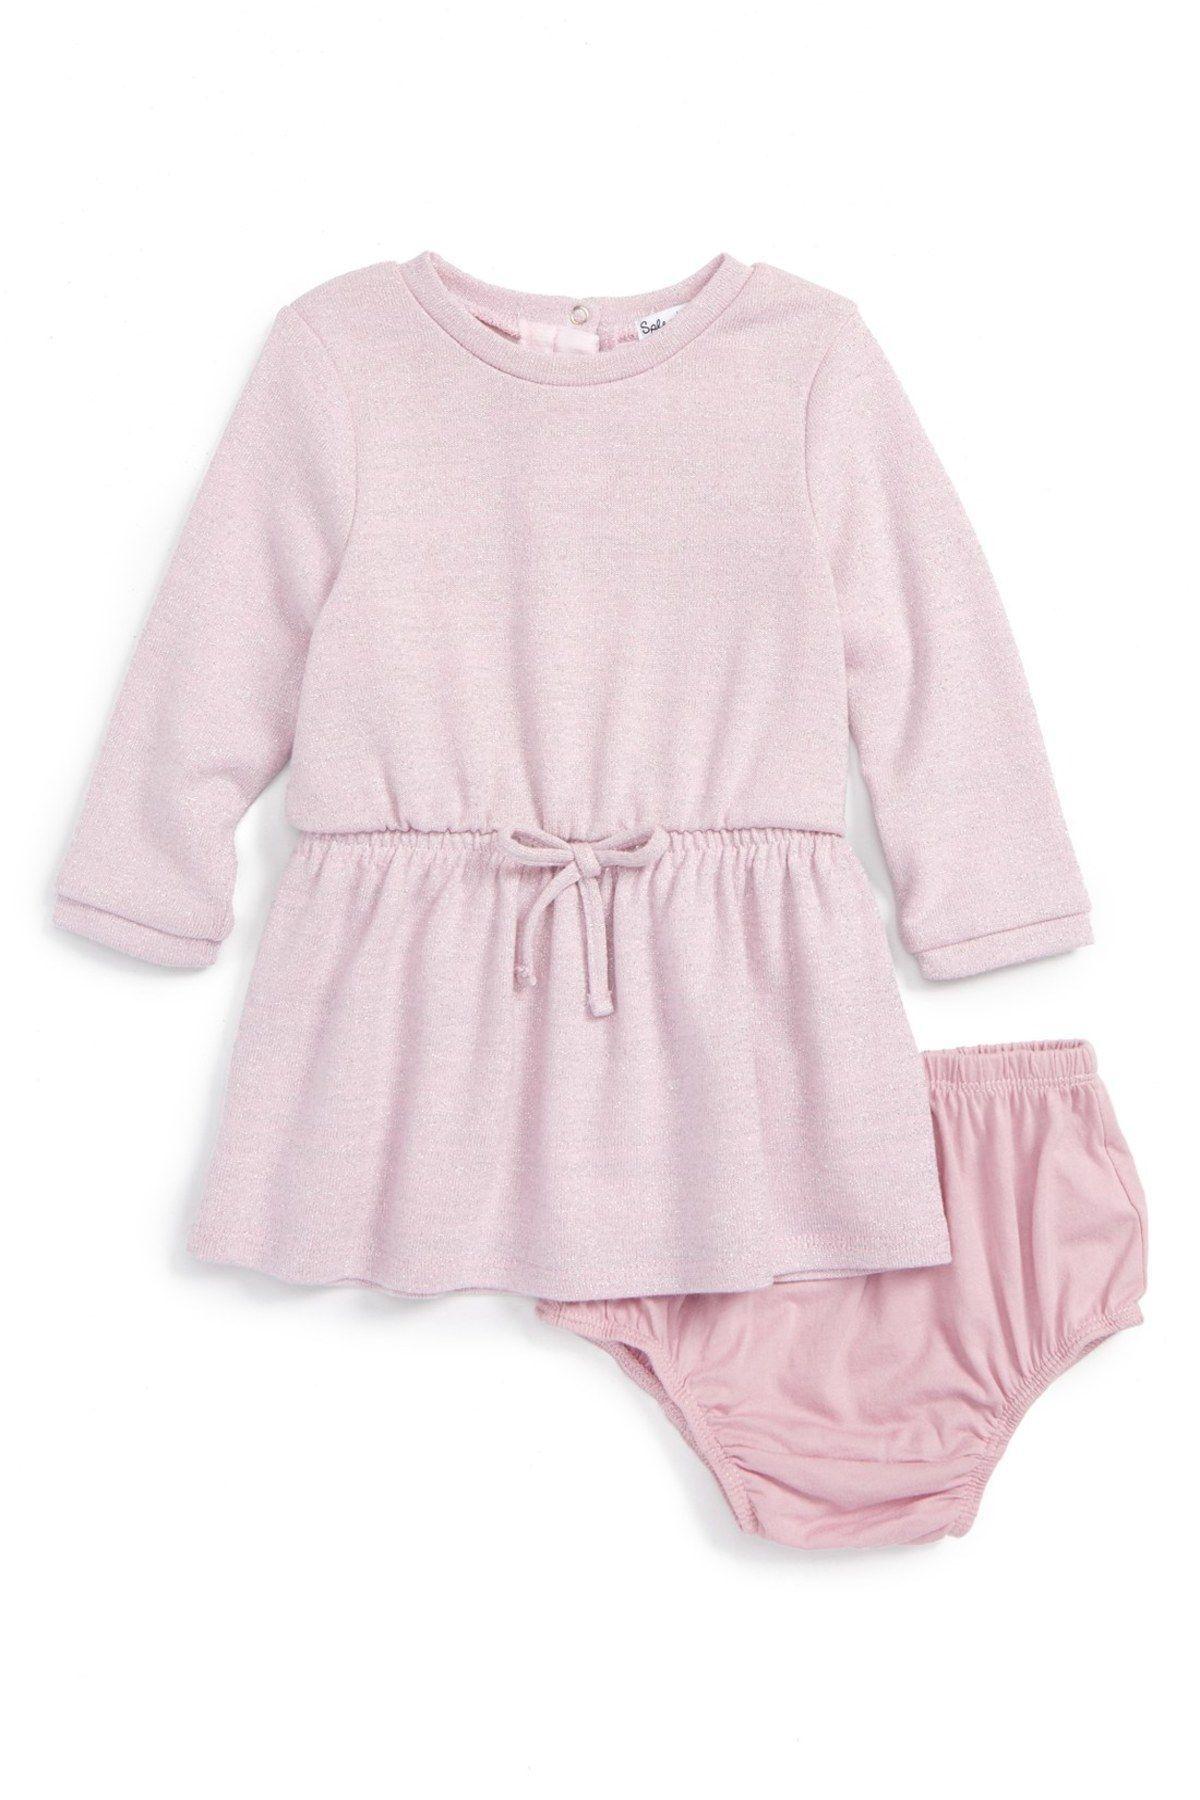 Knit sweater dress u bloomer set baby girls baby girl sweaters